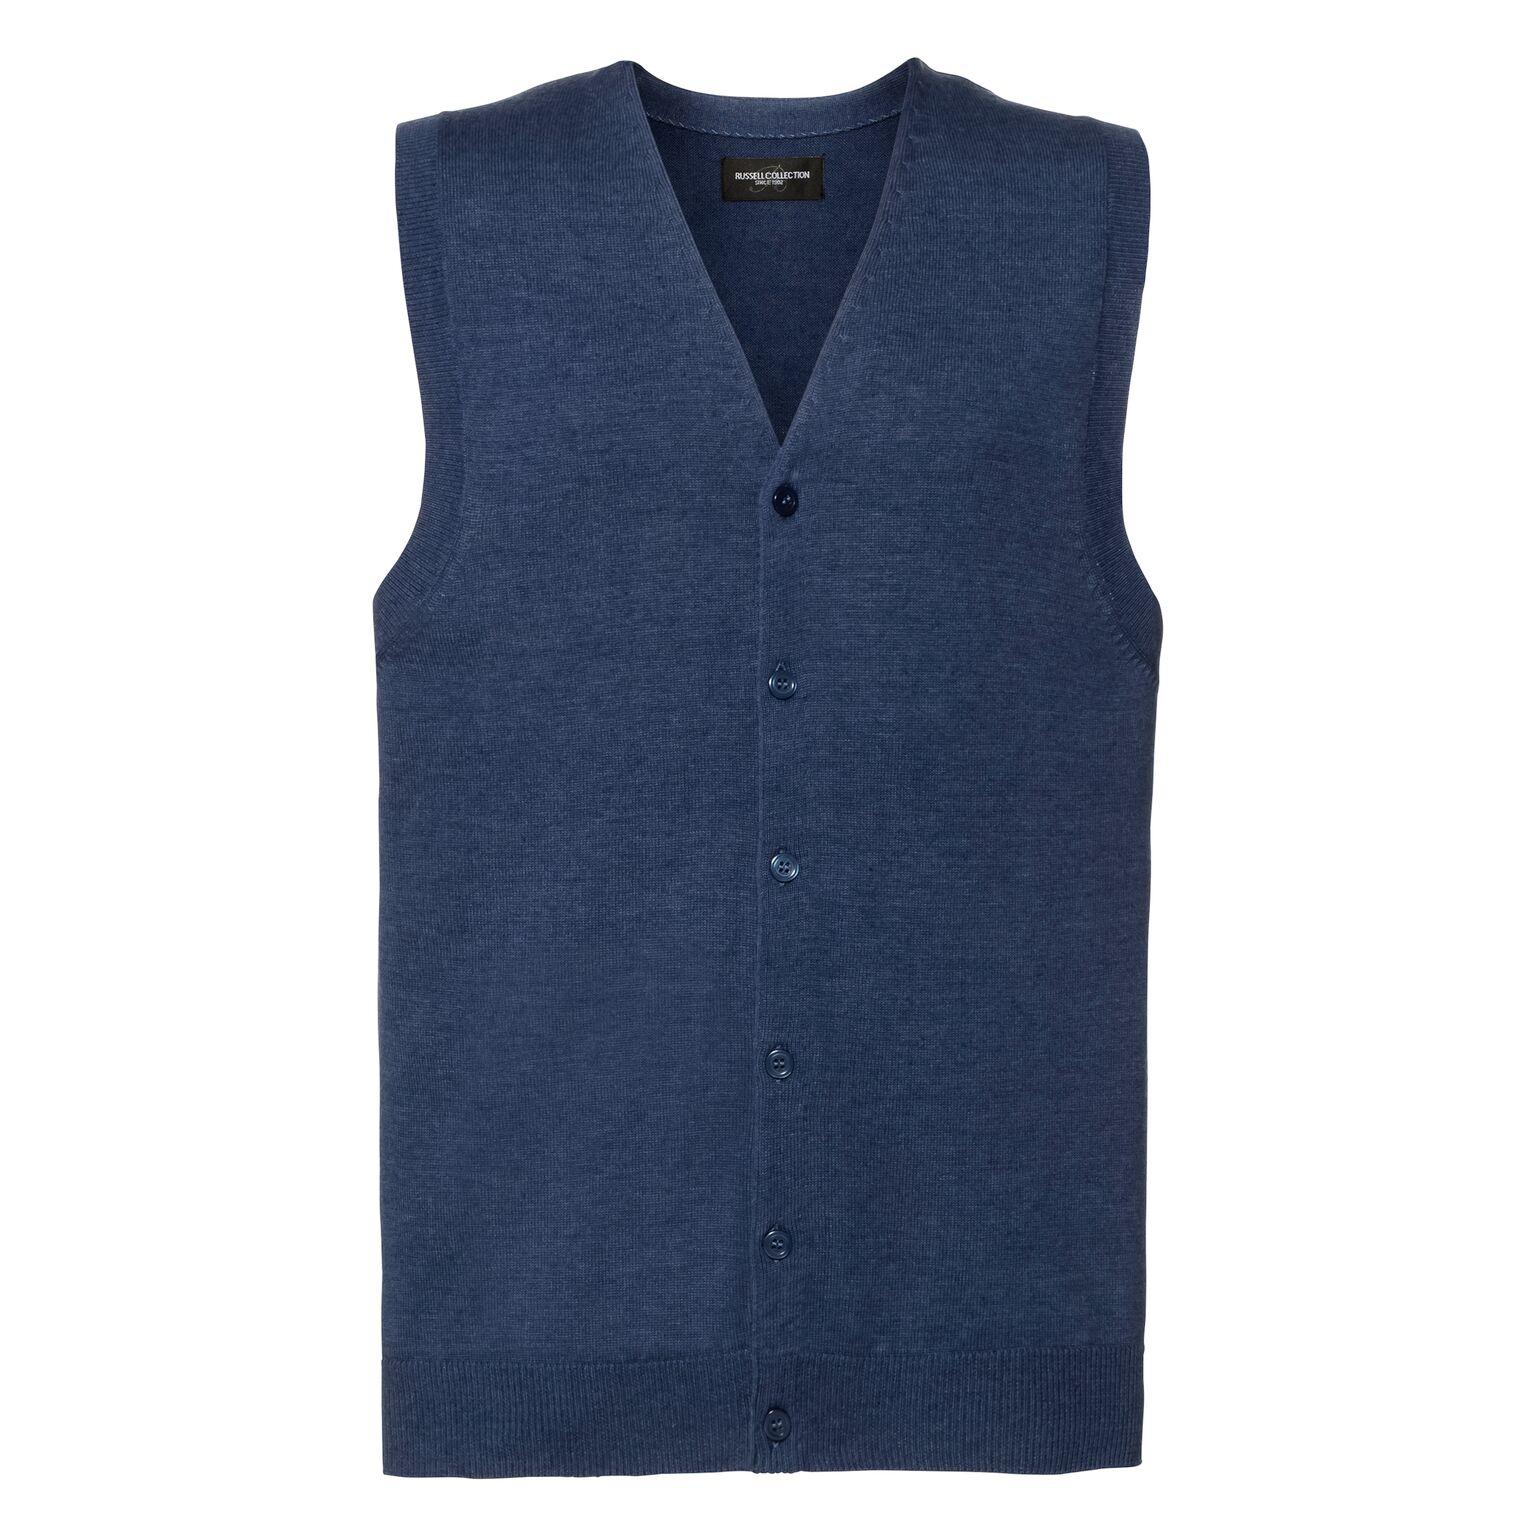 Russell Mens Sleeveless Cotton Acrylic V Neck Cardigan (3XL) (Denim Marl)